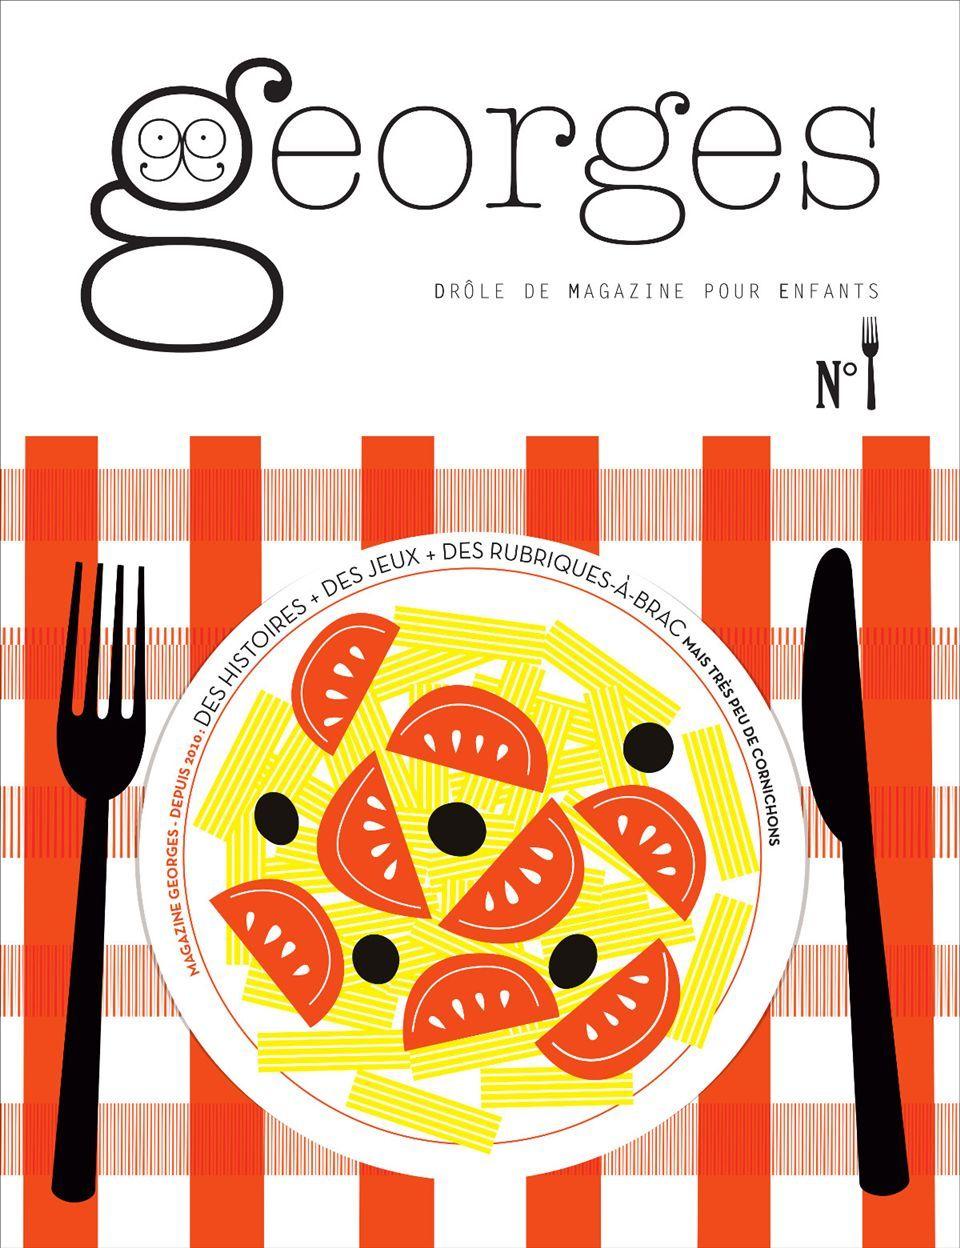 MAGAZINE GEORGES N 24 - FOURCHETTE - N  SEPTEMBRE 2016